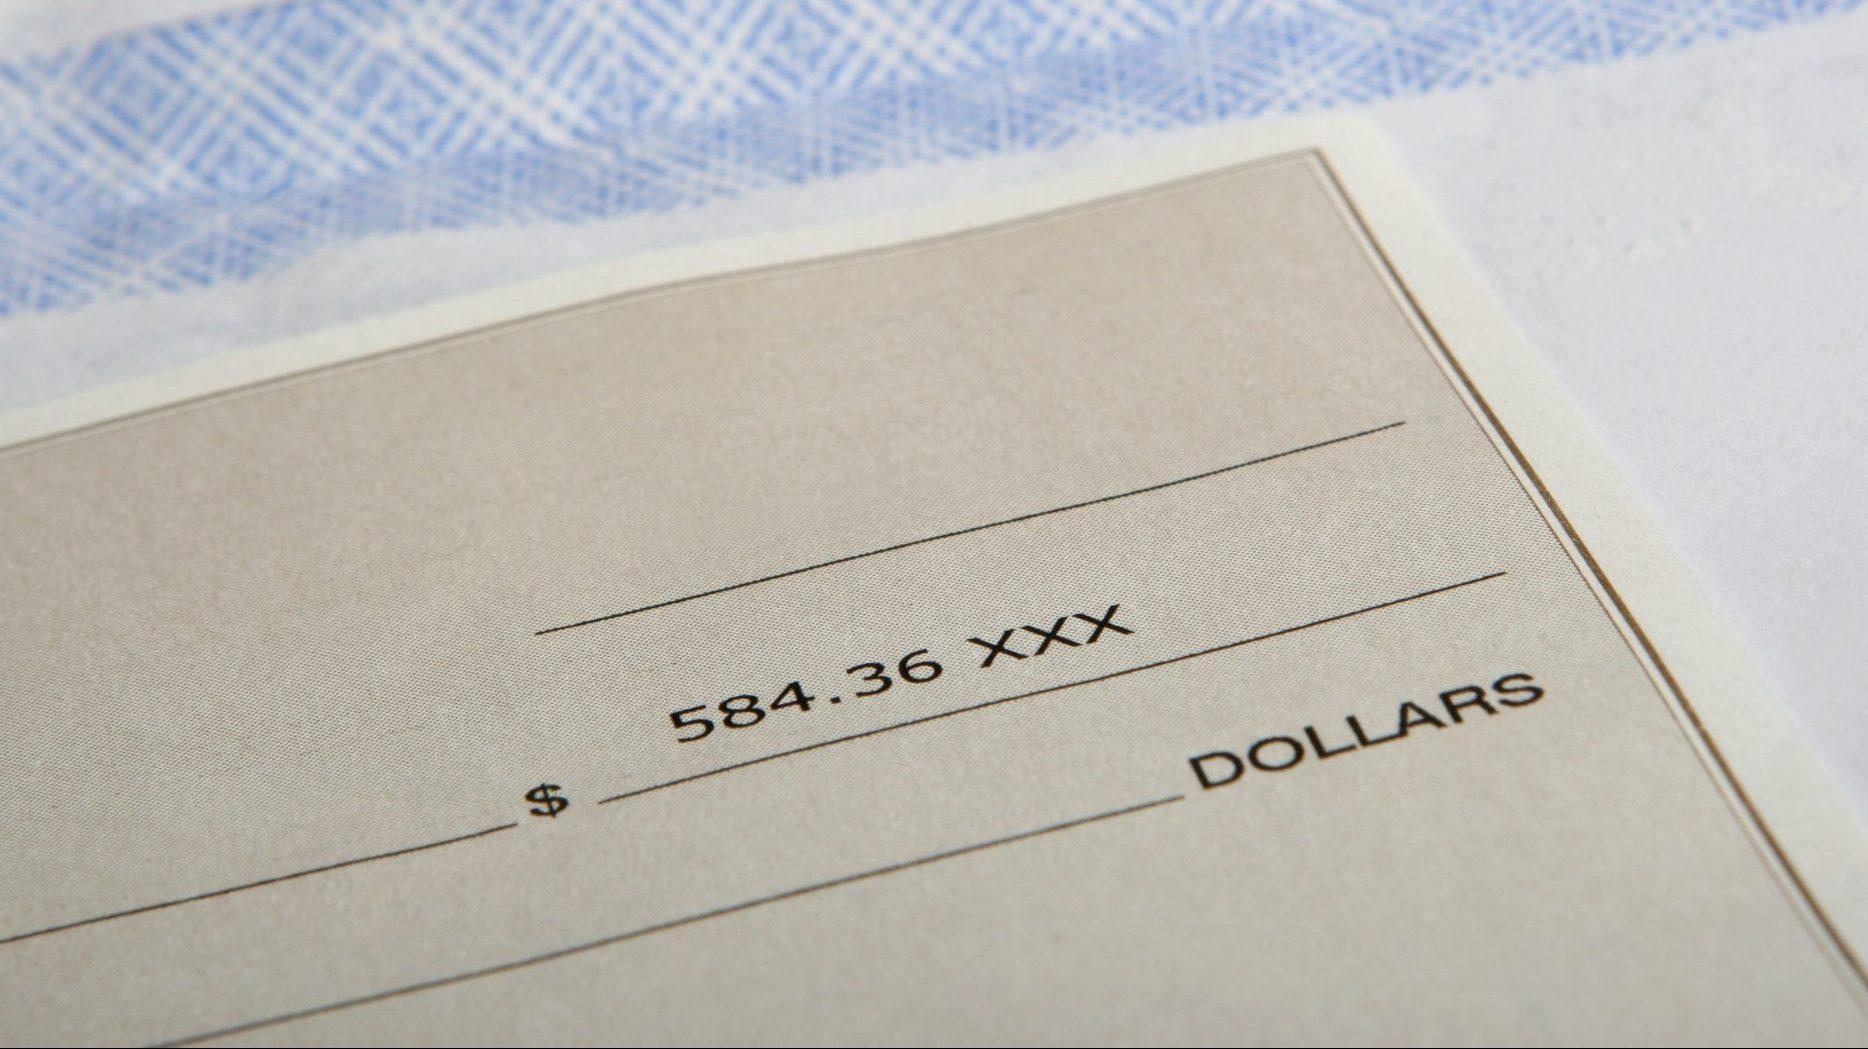 Do Tax Rebates Happen Automatically?